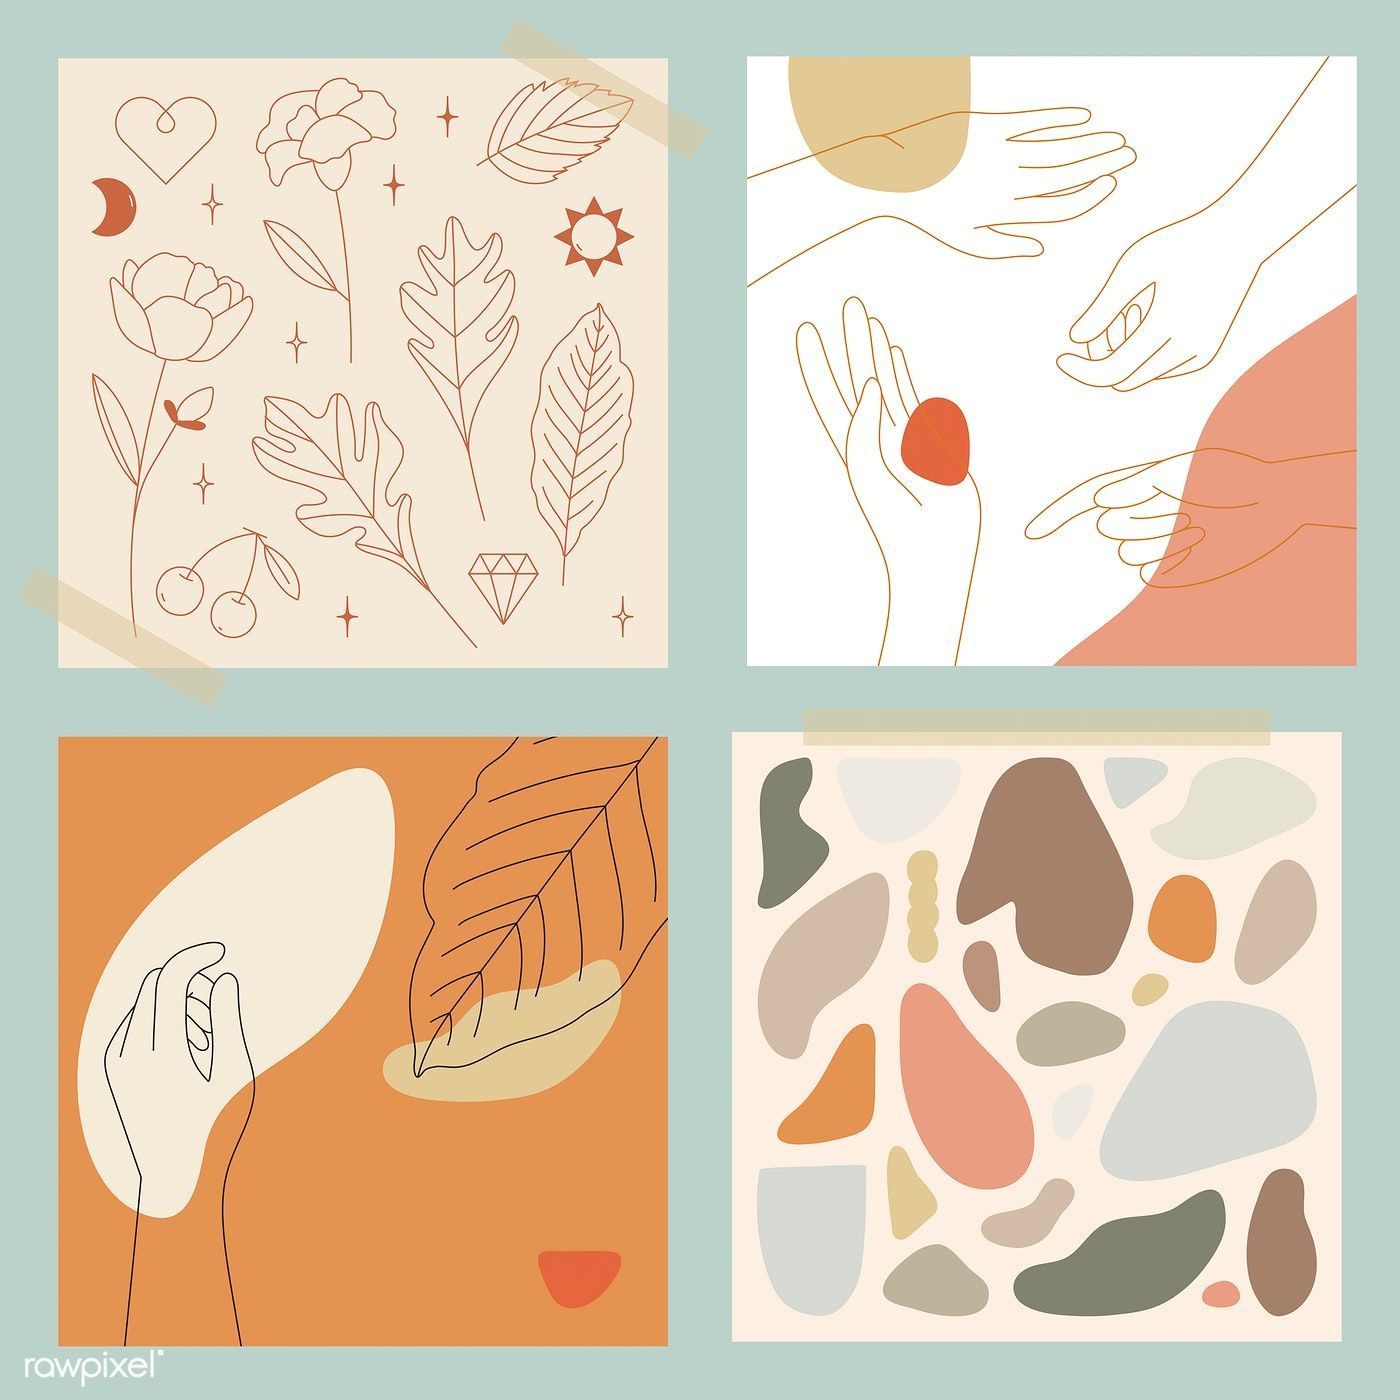 Download premium vector of Feminine Line Art collection